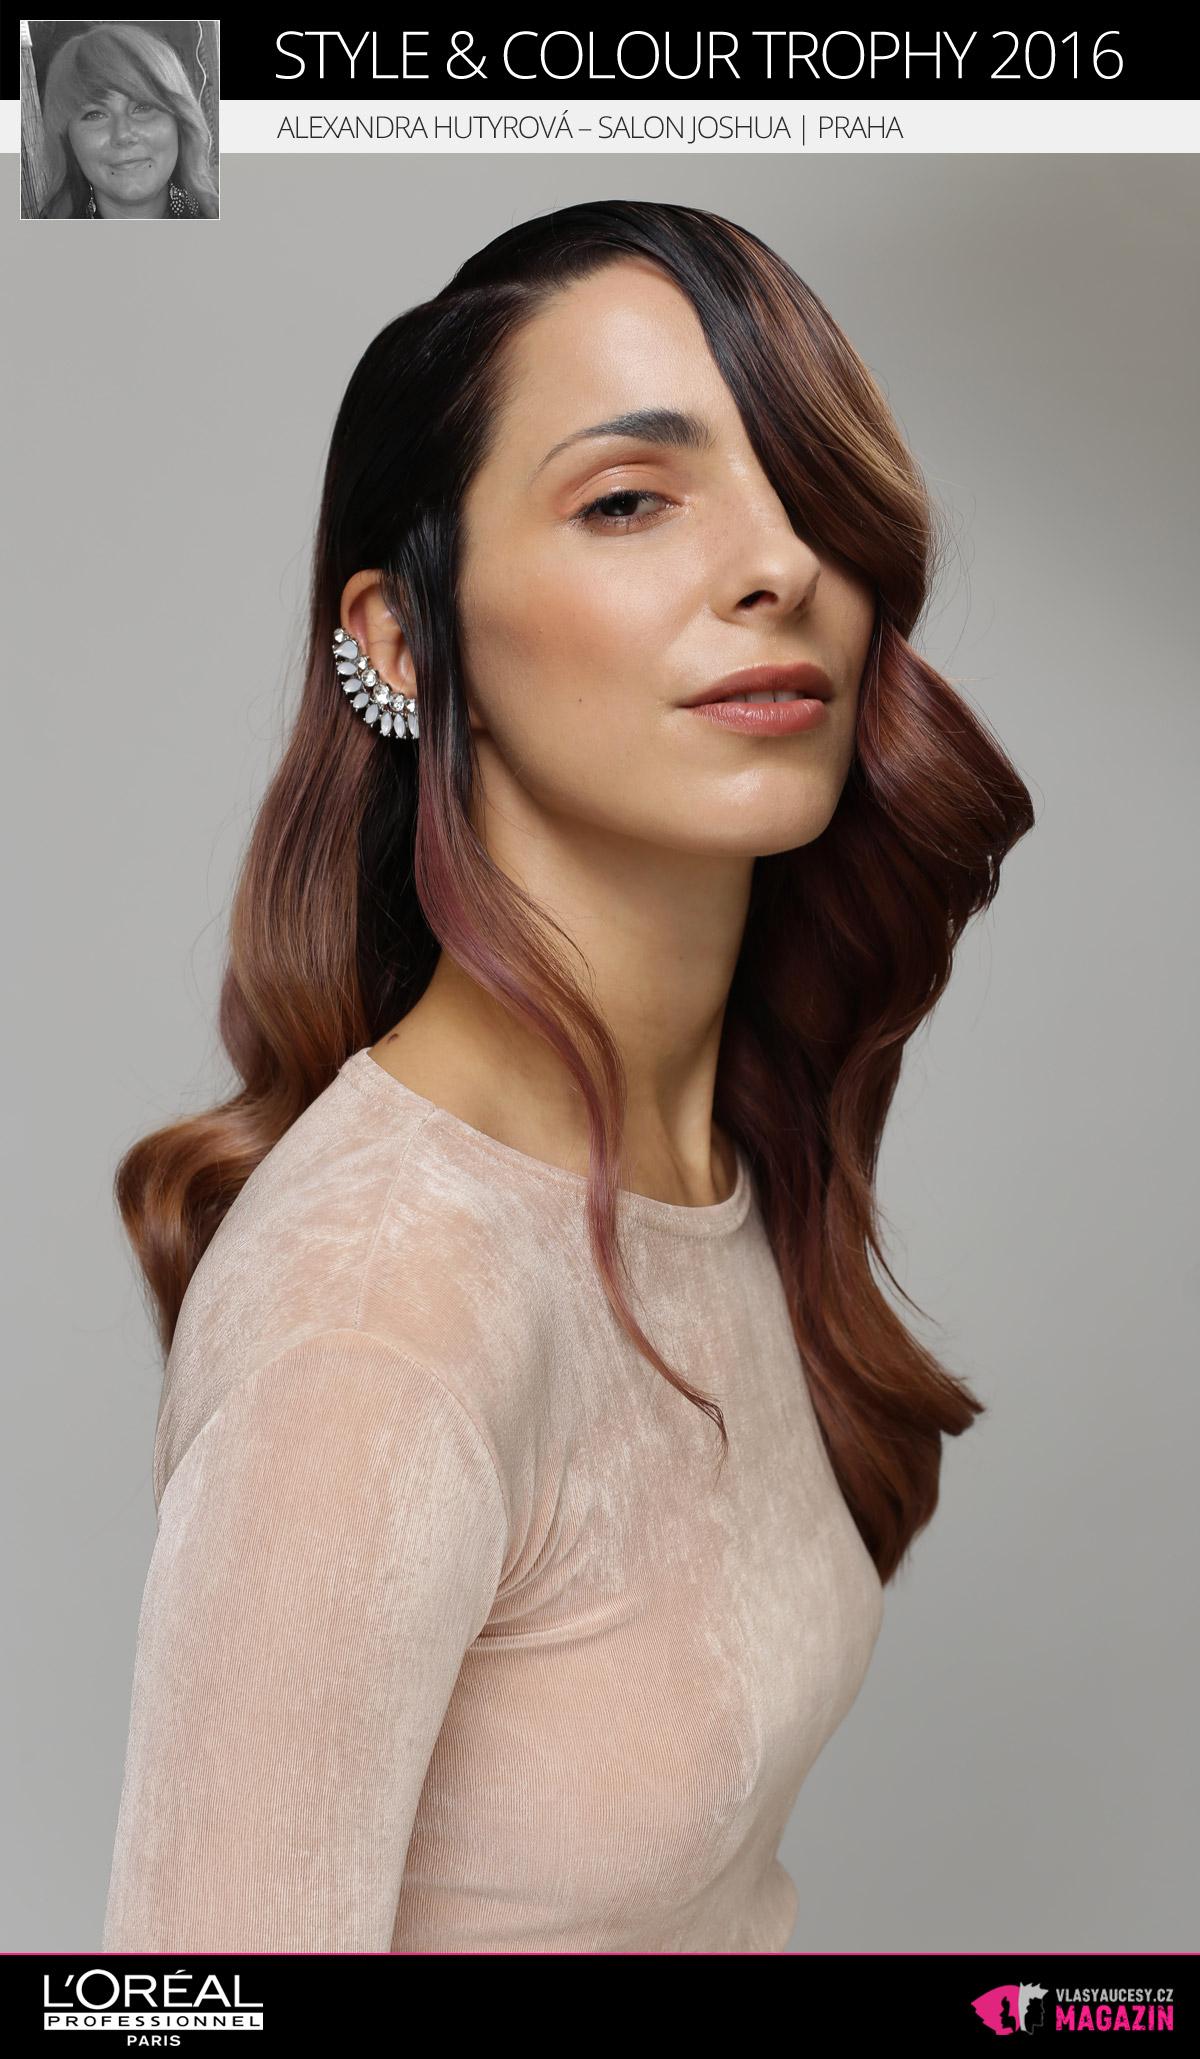 Alexandra Hutyrová – Salon Joshua, Praha   L'Oréal Style & Colour Trophy 2016